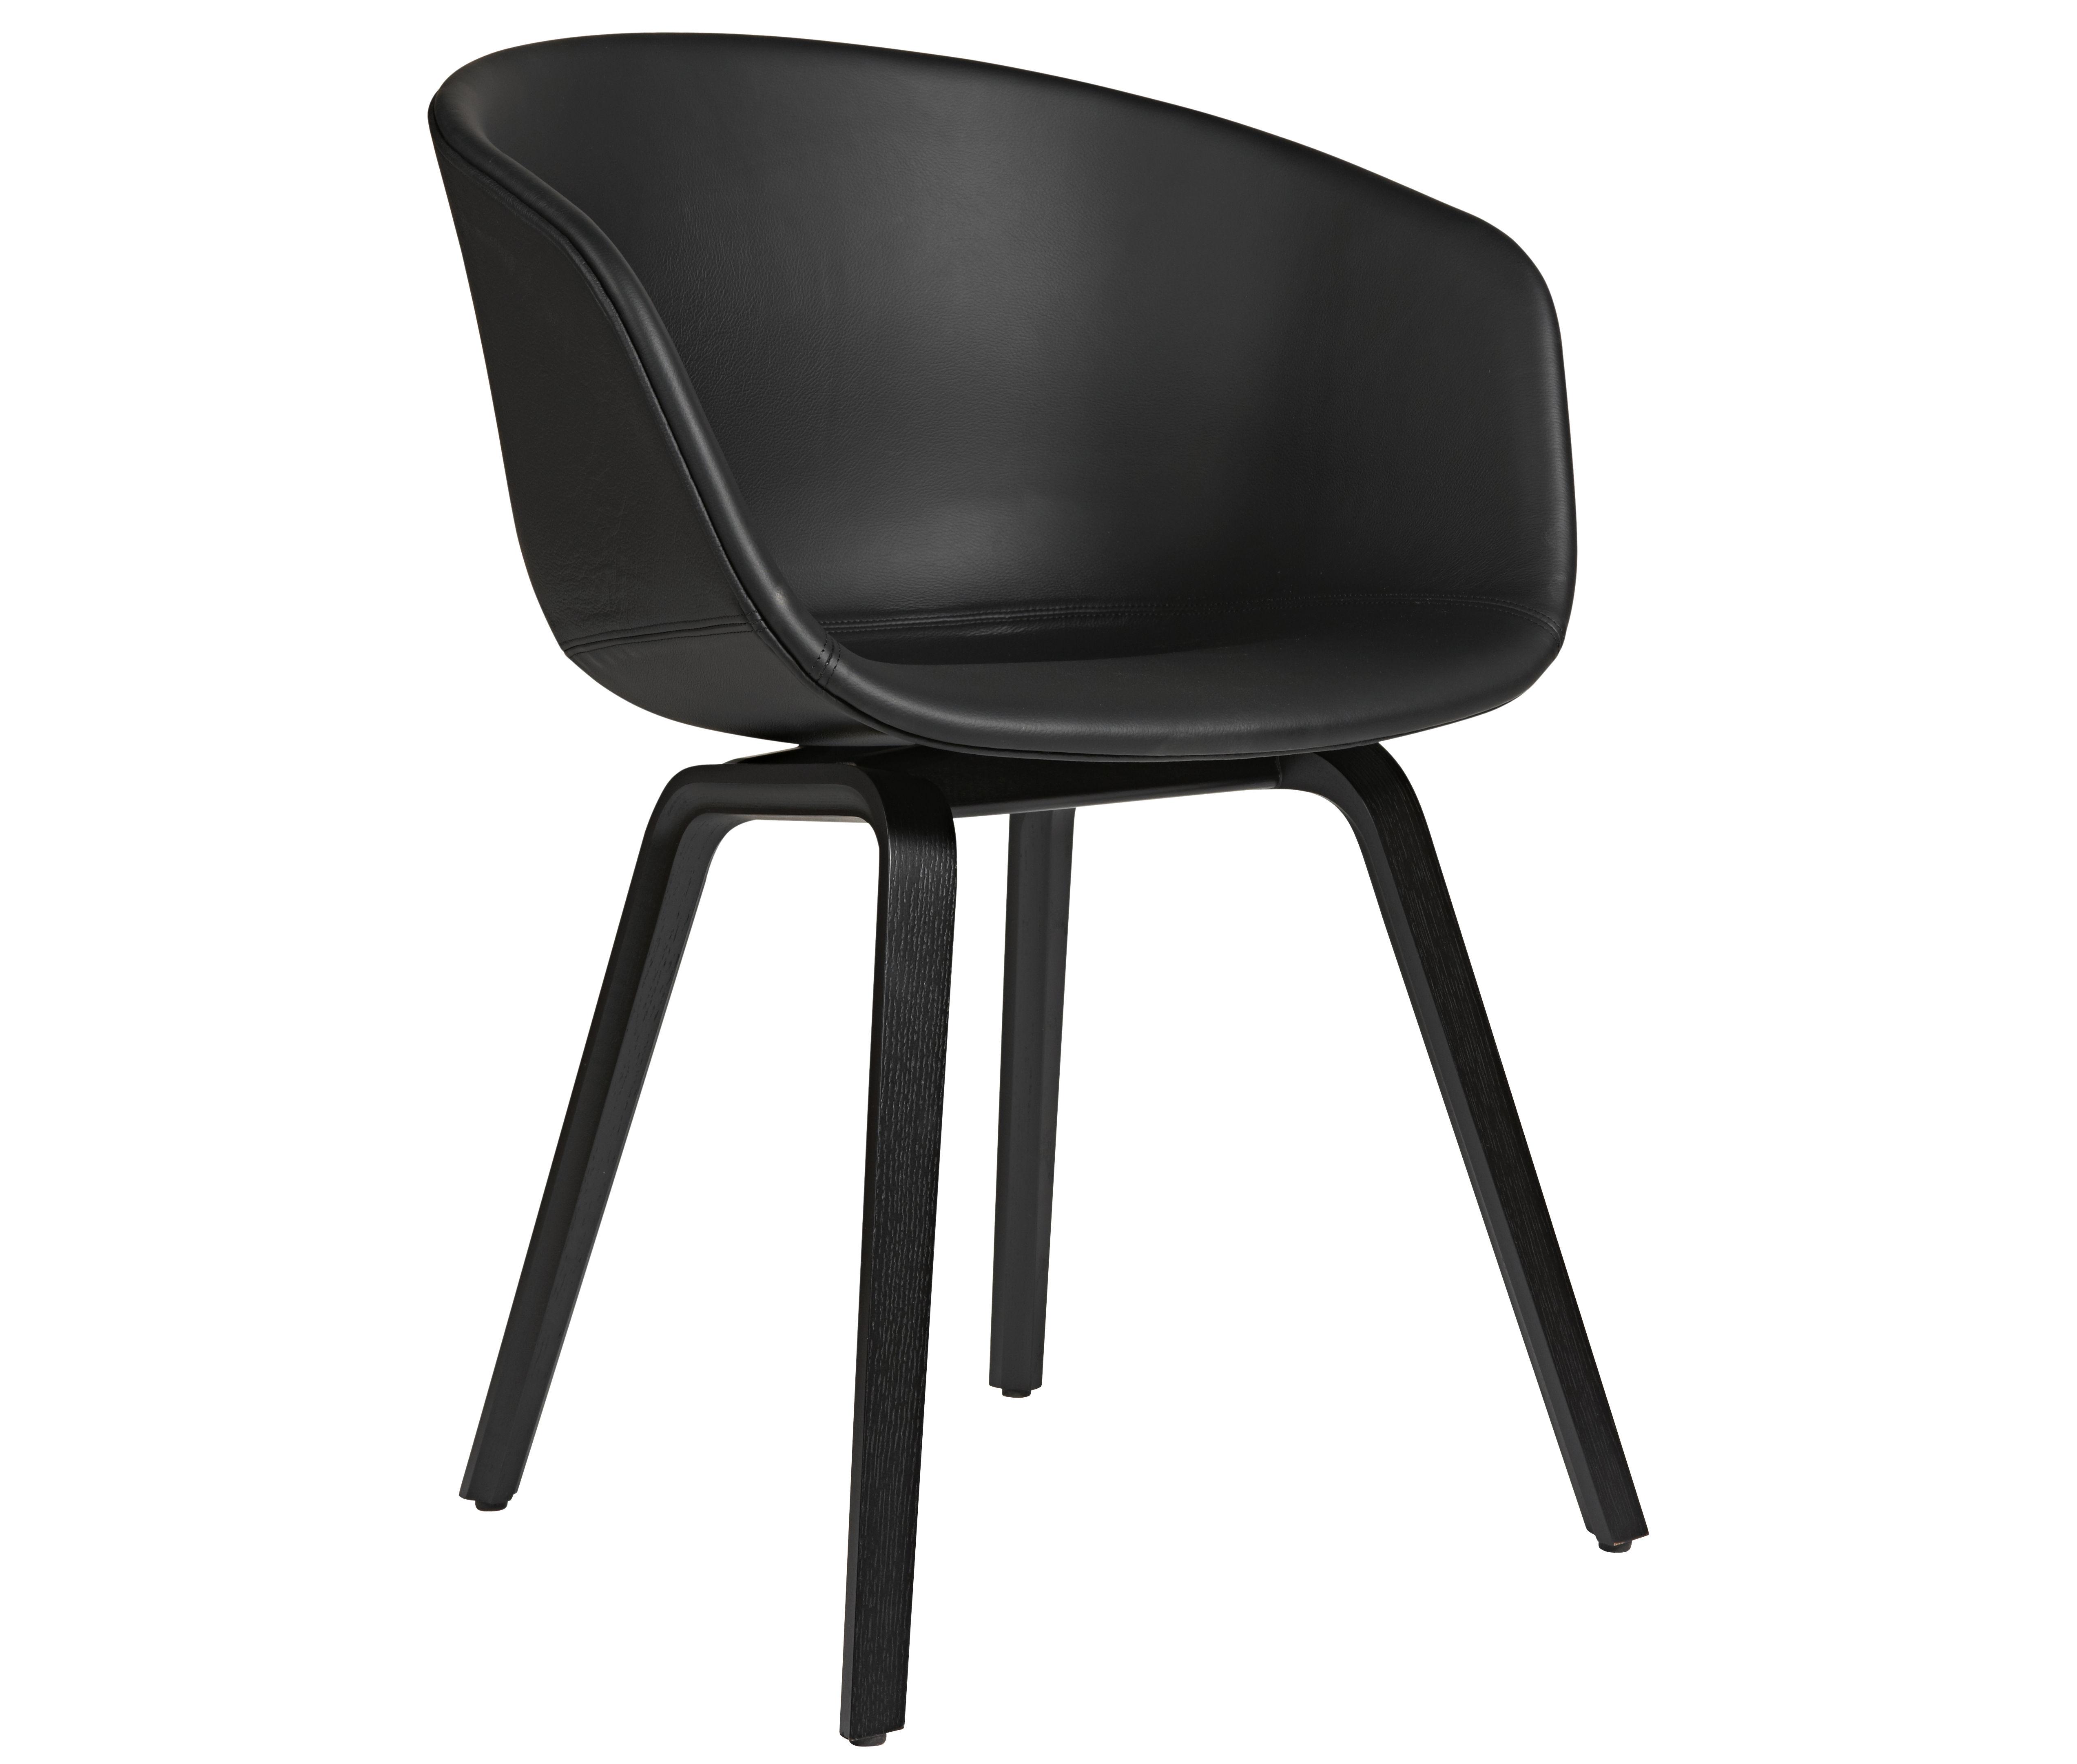 Möbel - Stühle  - About a chair AAC23 Gepolsterter Sessel / Leder - 4-beinig - Hay - Leder schwarz - getöntes Eichenholzfurnier, Leder, Polypropylen, Schaumstoff